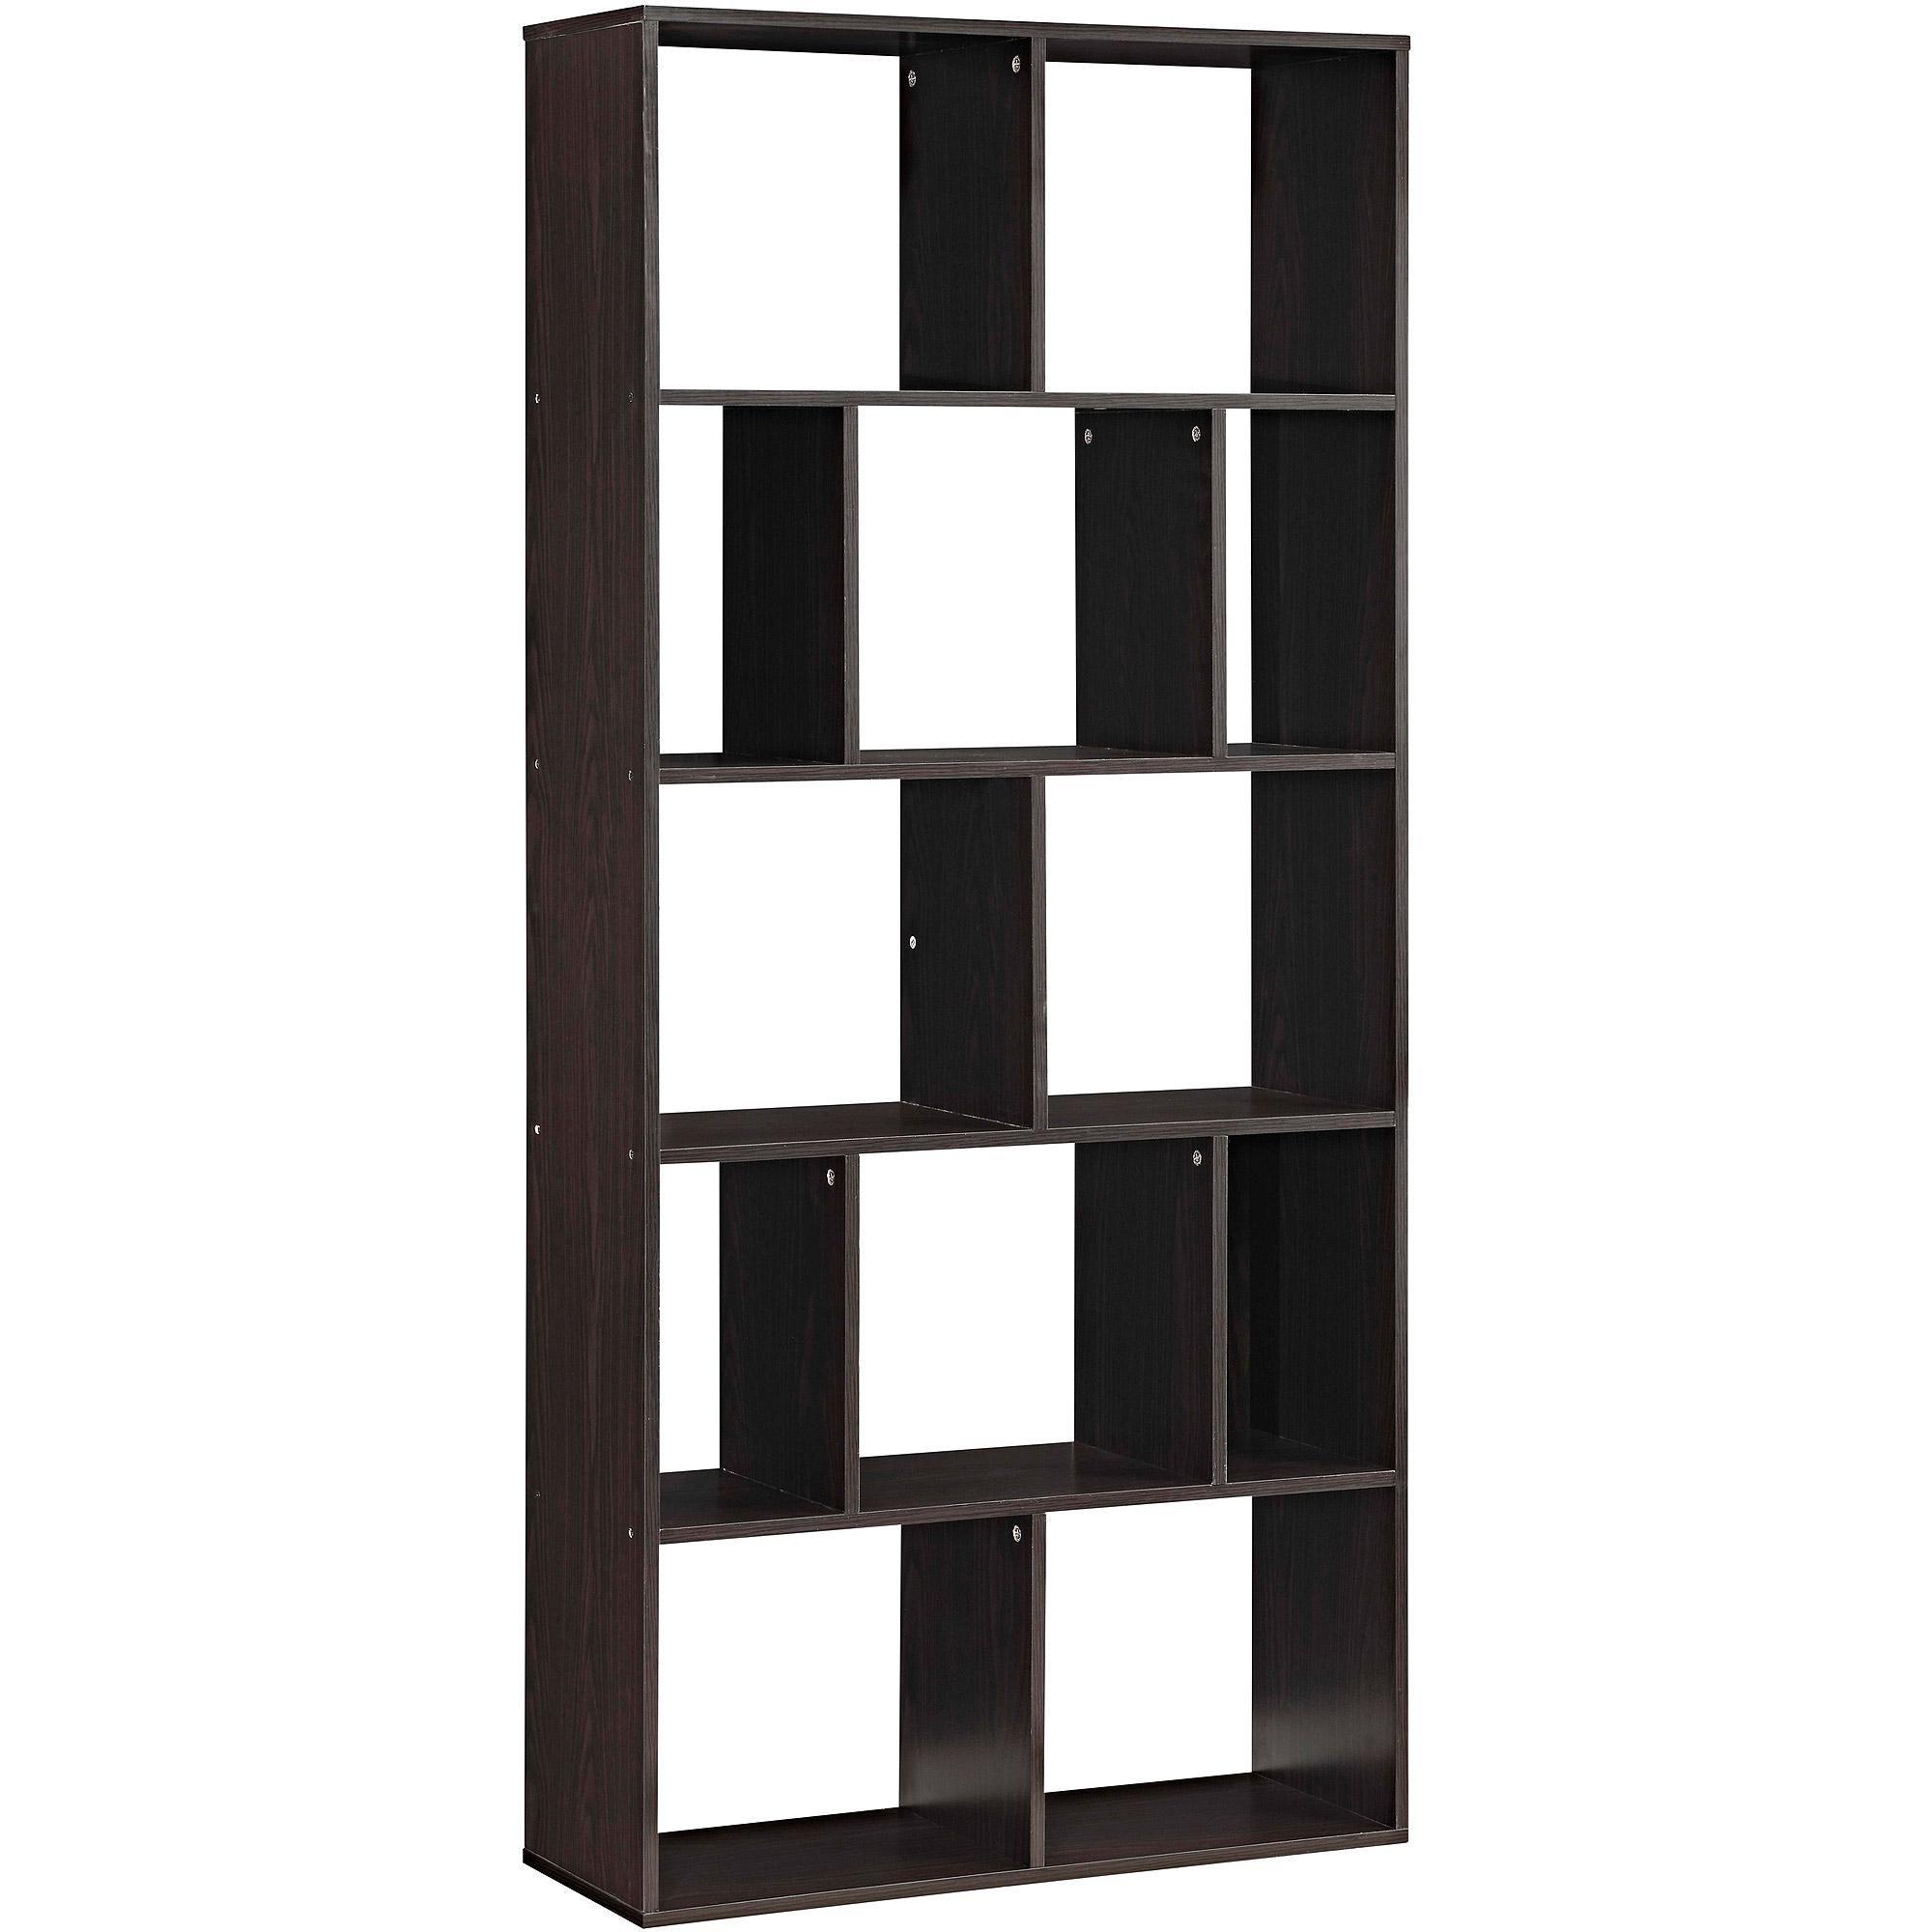 $50 sale - Mainstays Home 12-Shelf Bookcase - Walmart com